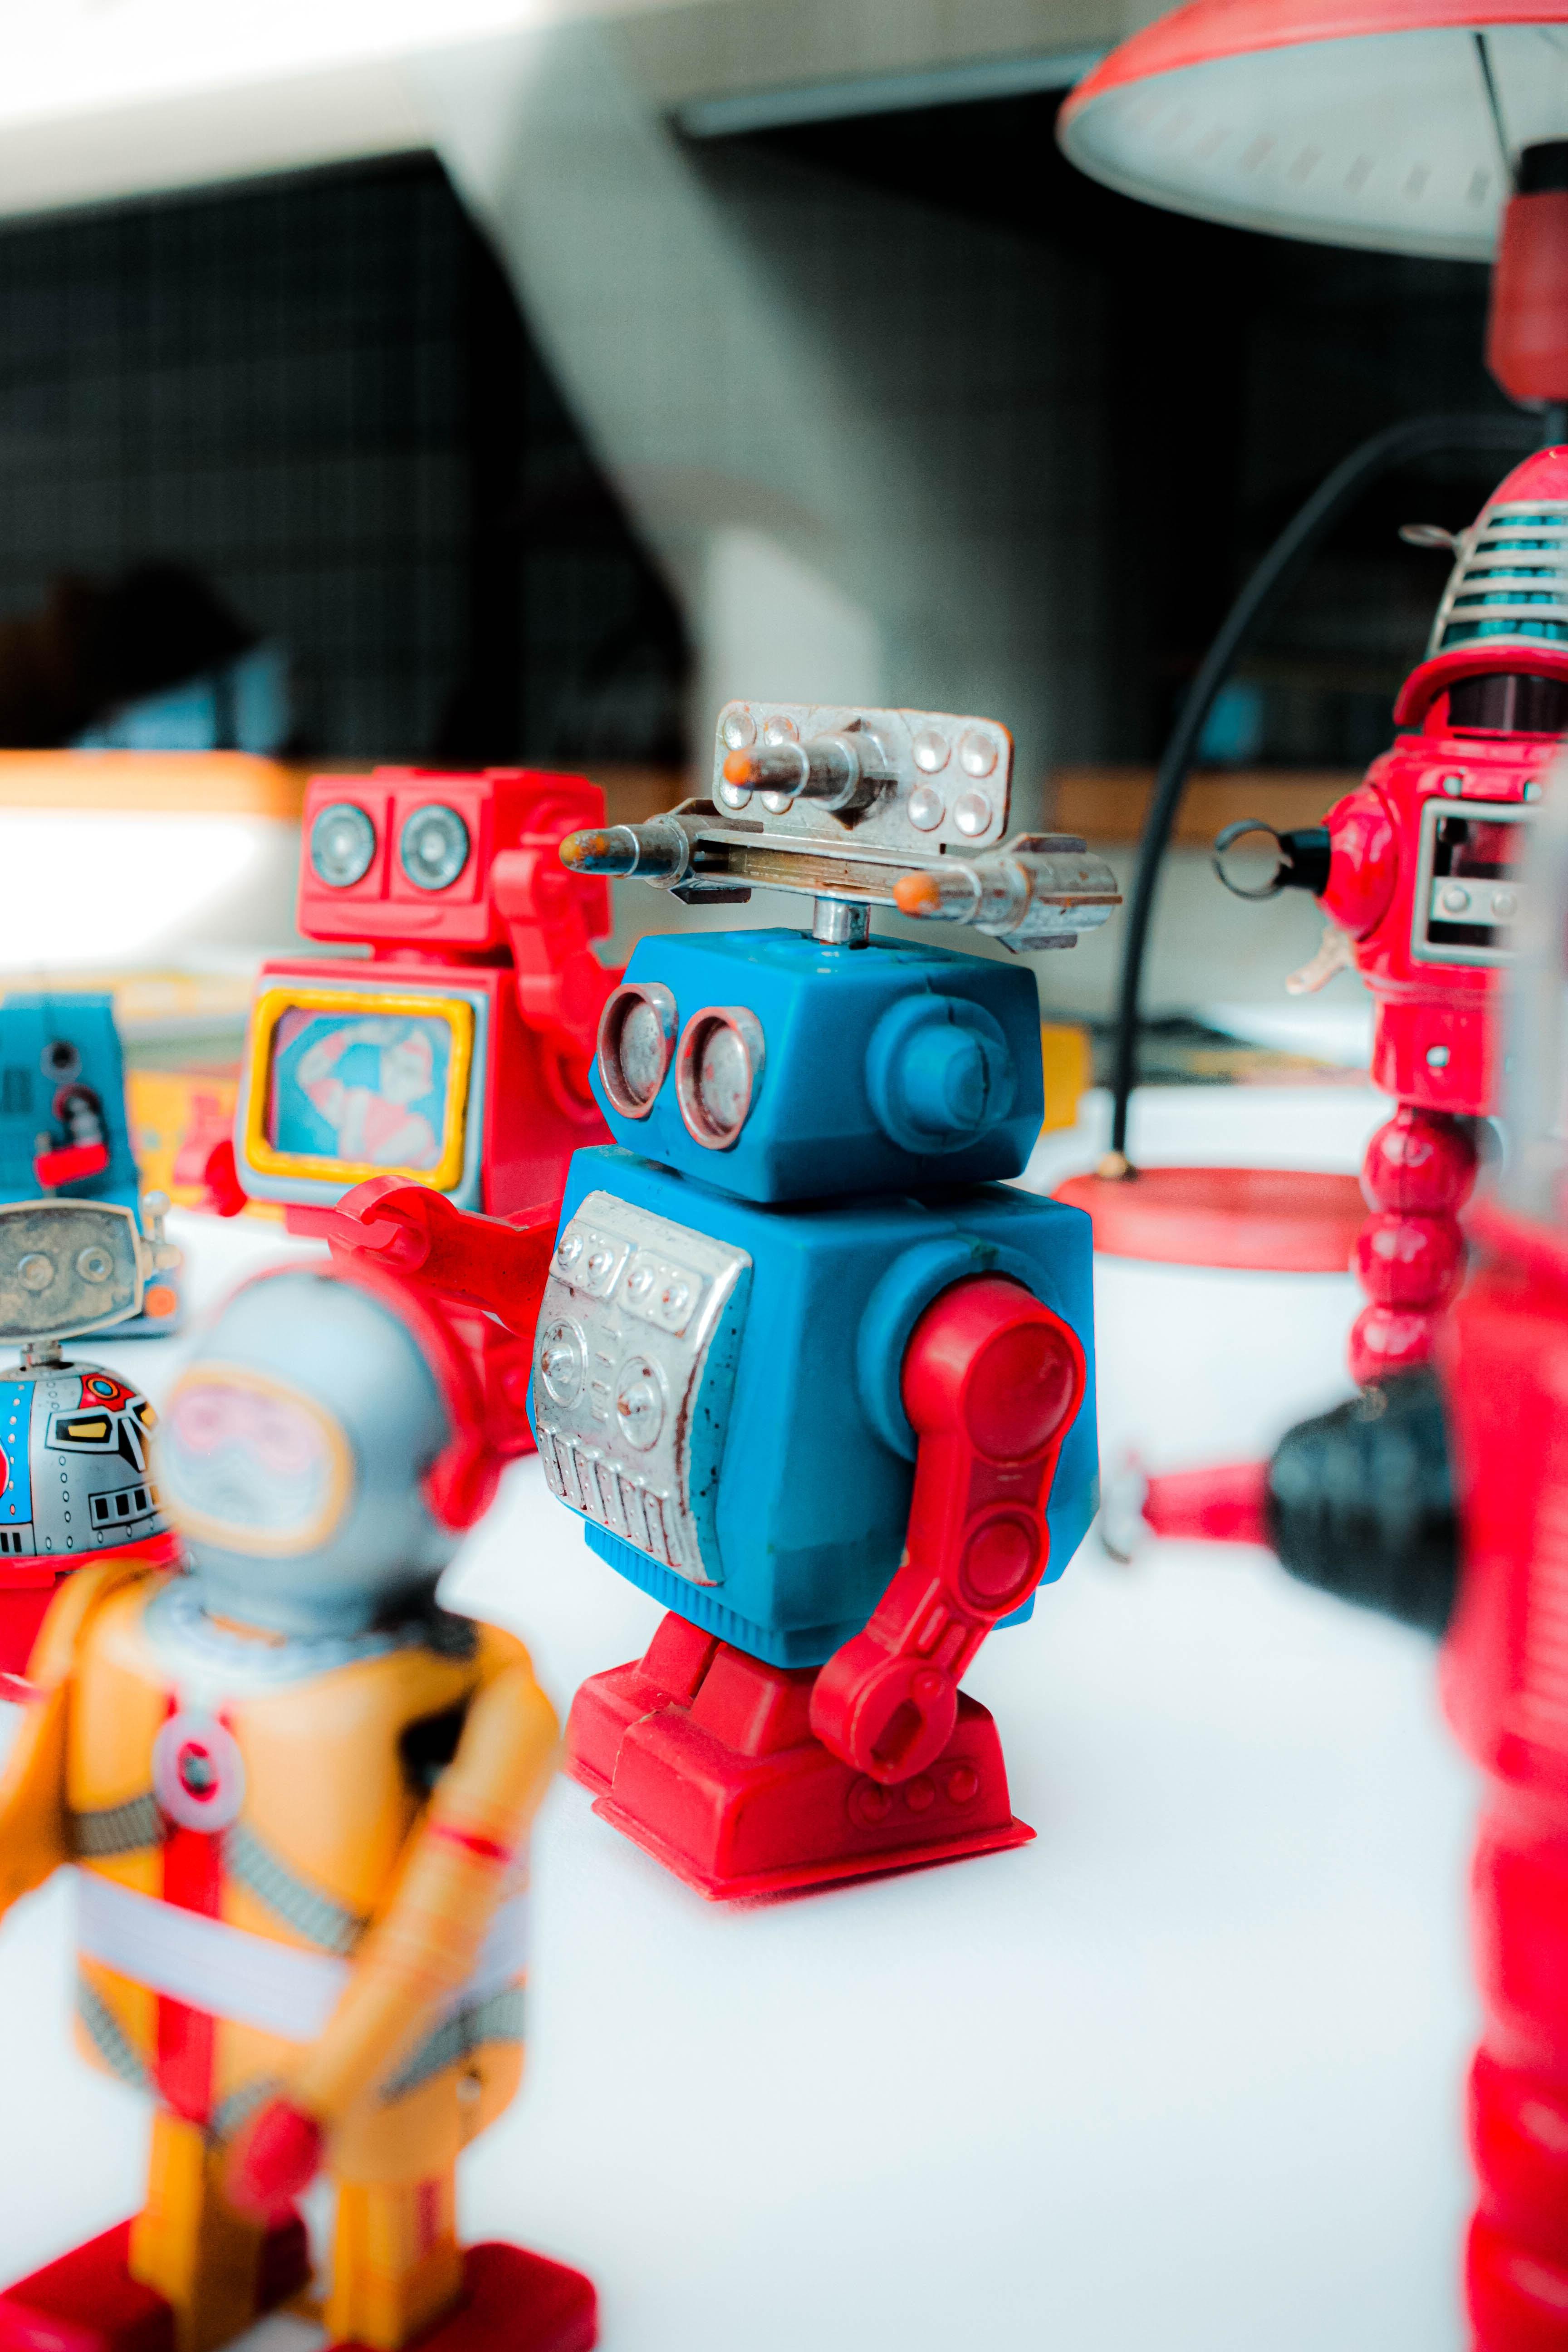 Riveting Robots [Ages 2-4] HQ